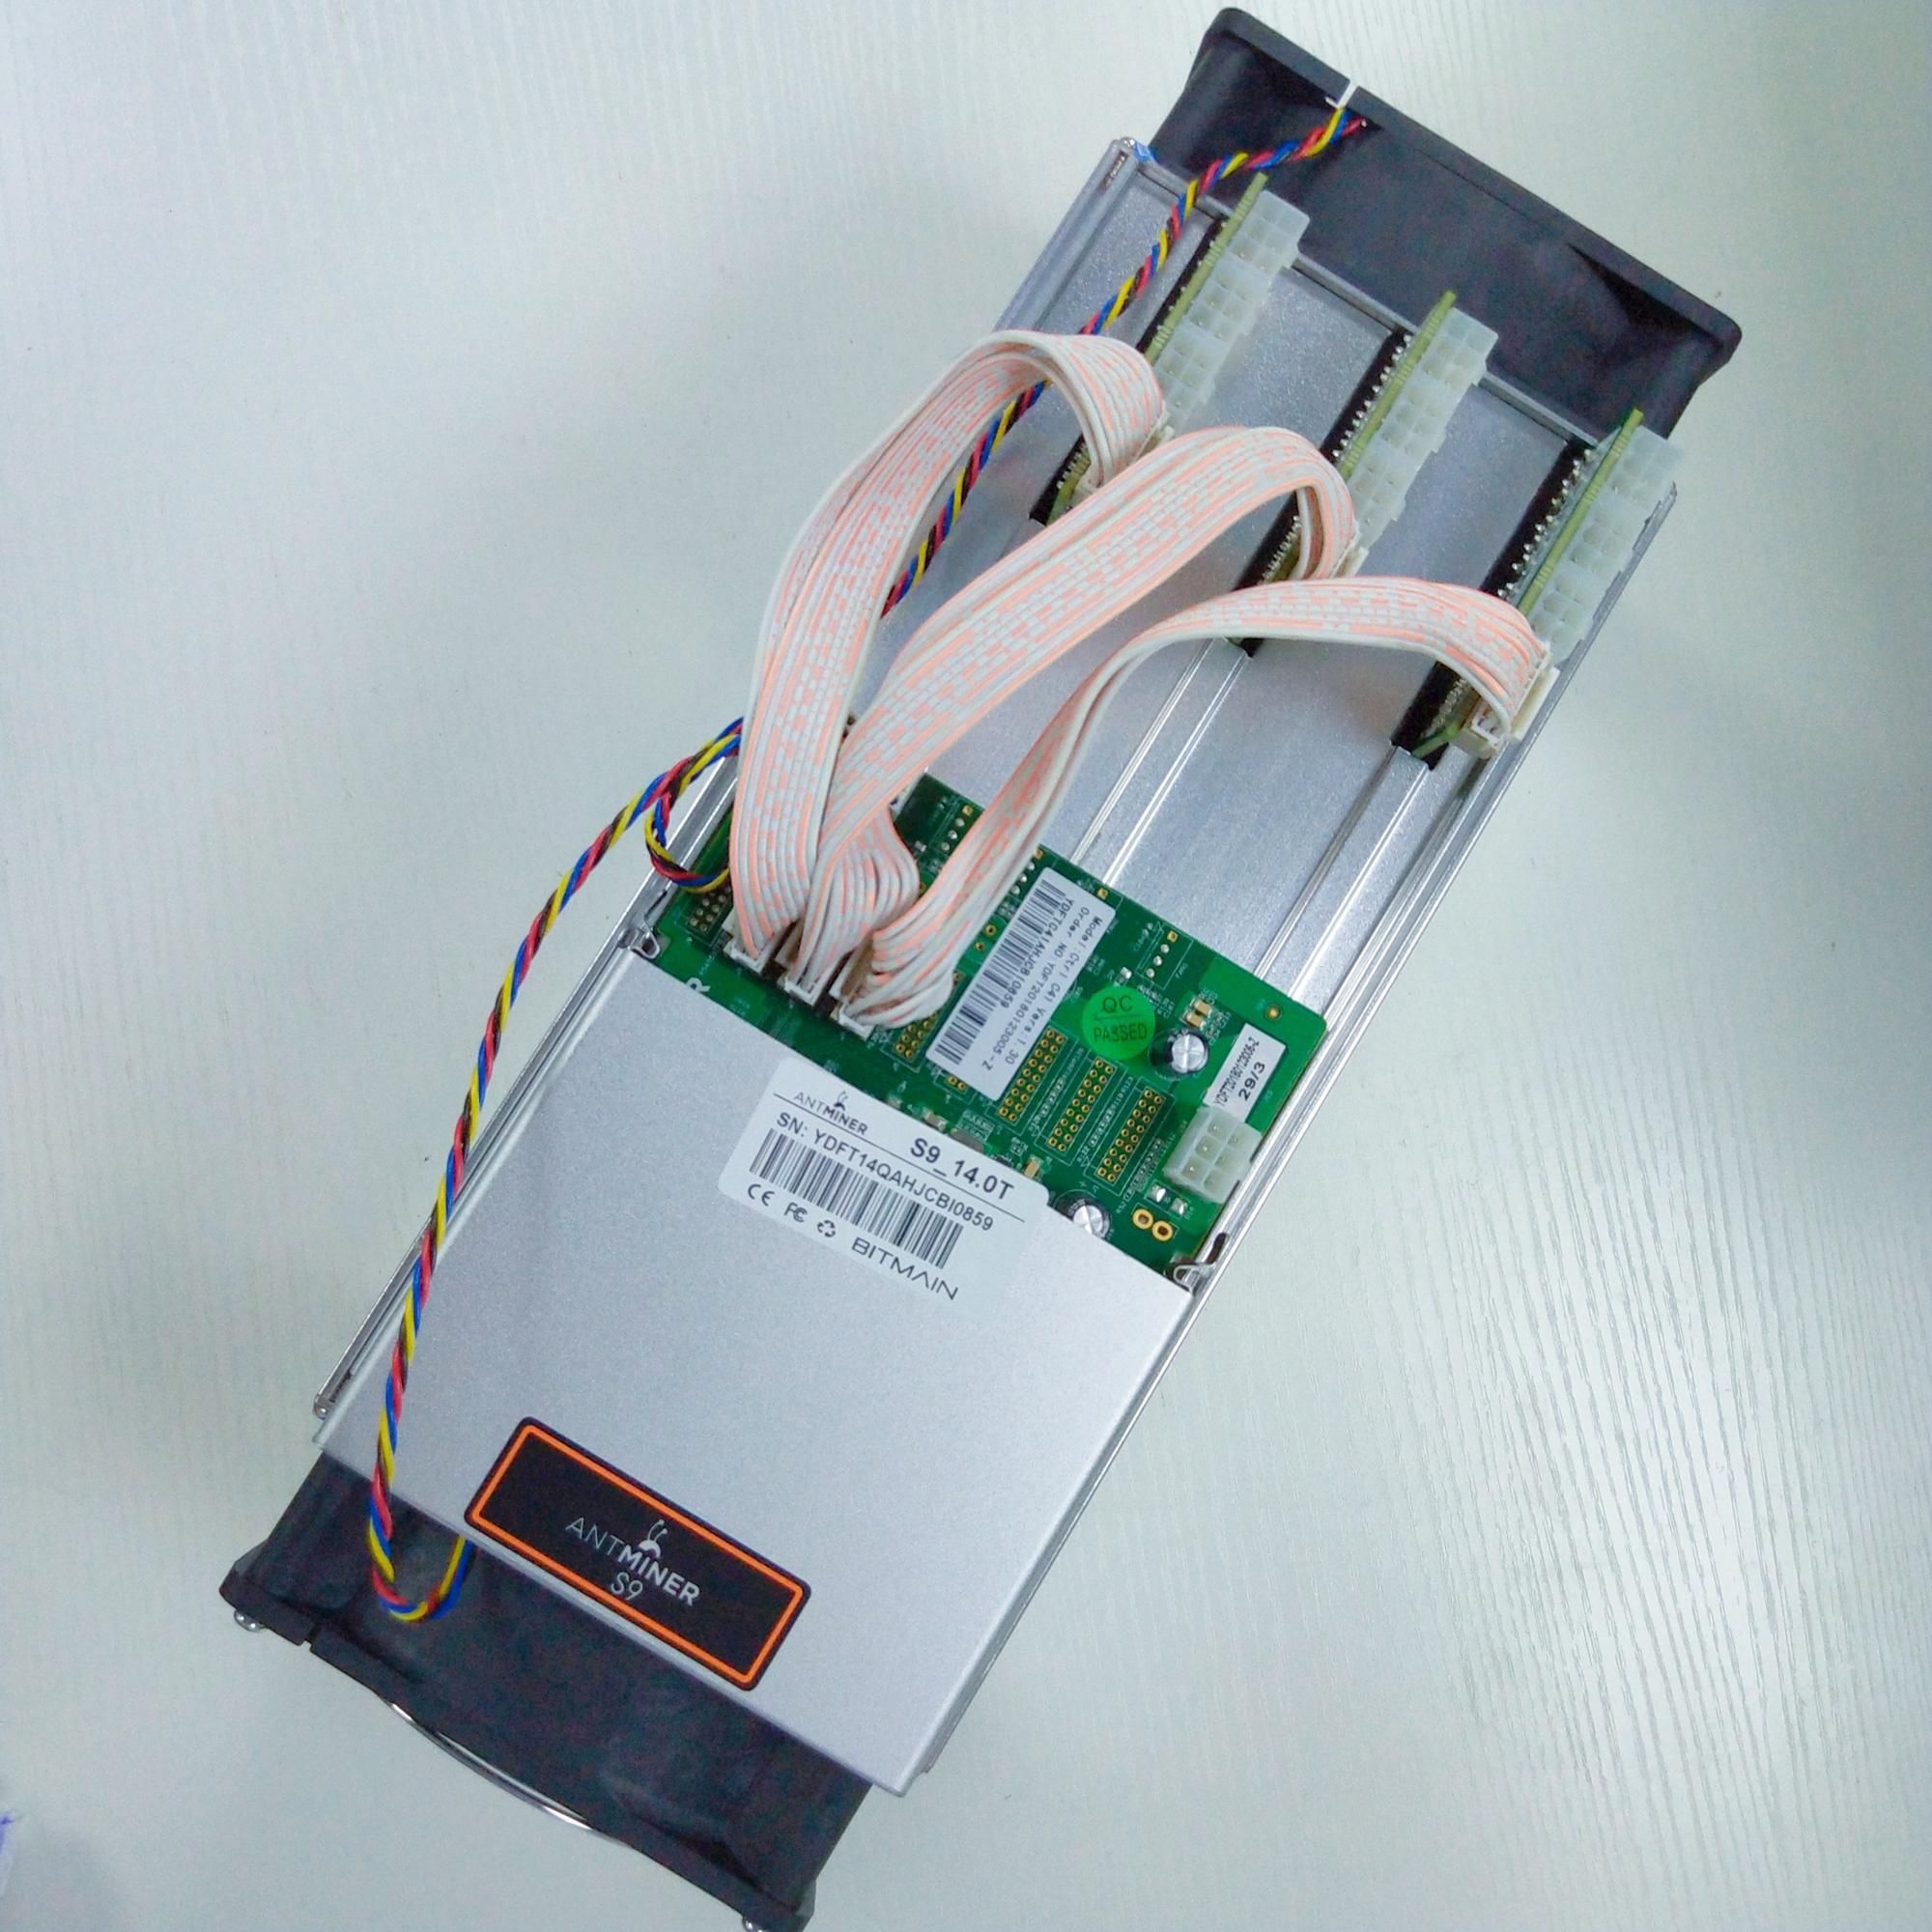 Ontdek De Fabrikant Asic Spaanplaat Van Hoge Kwaliteit Voor Sell Printed Circuit Board Pcb1 Zhejiang Oulong Electronics Co Bij Alibabacom